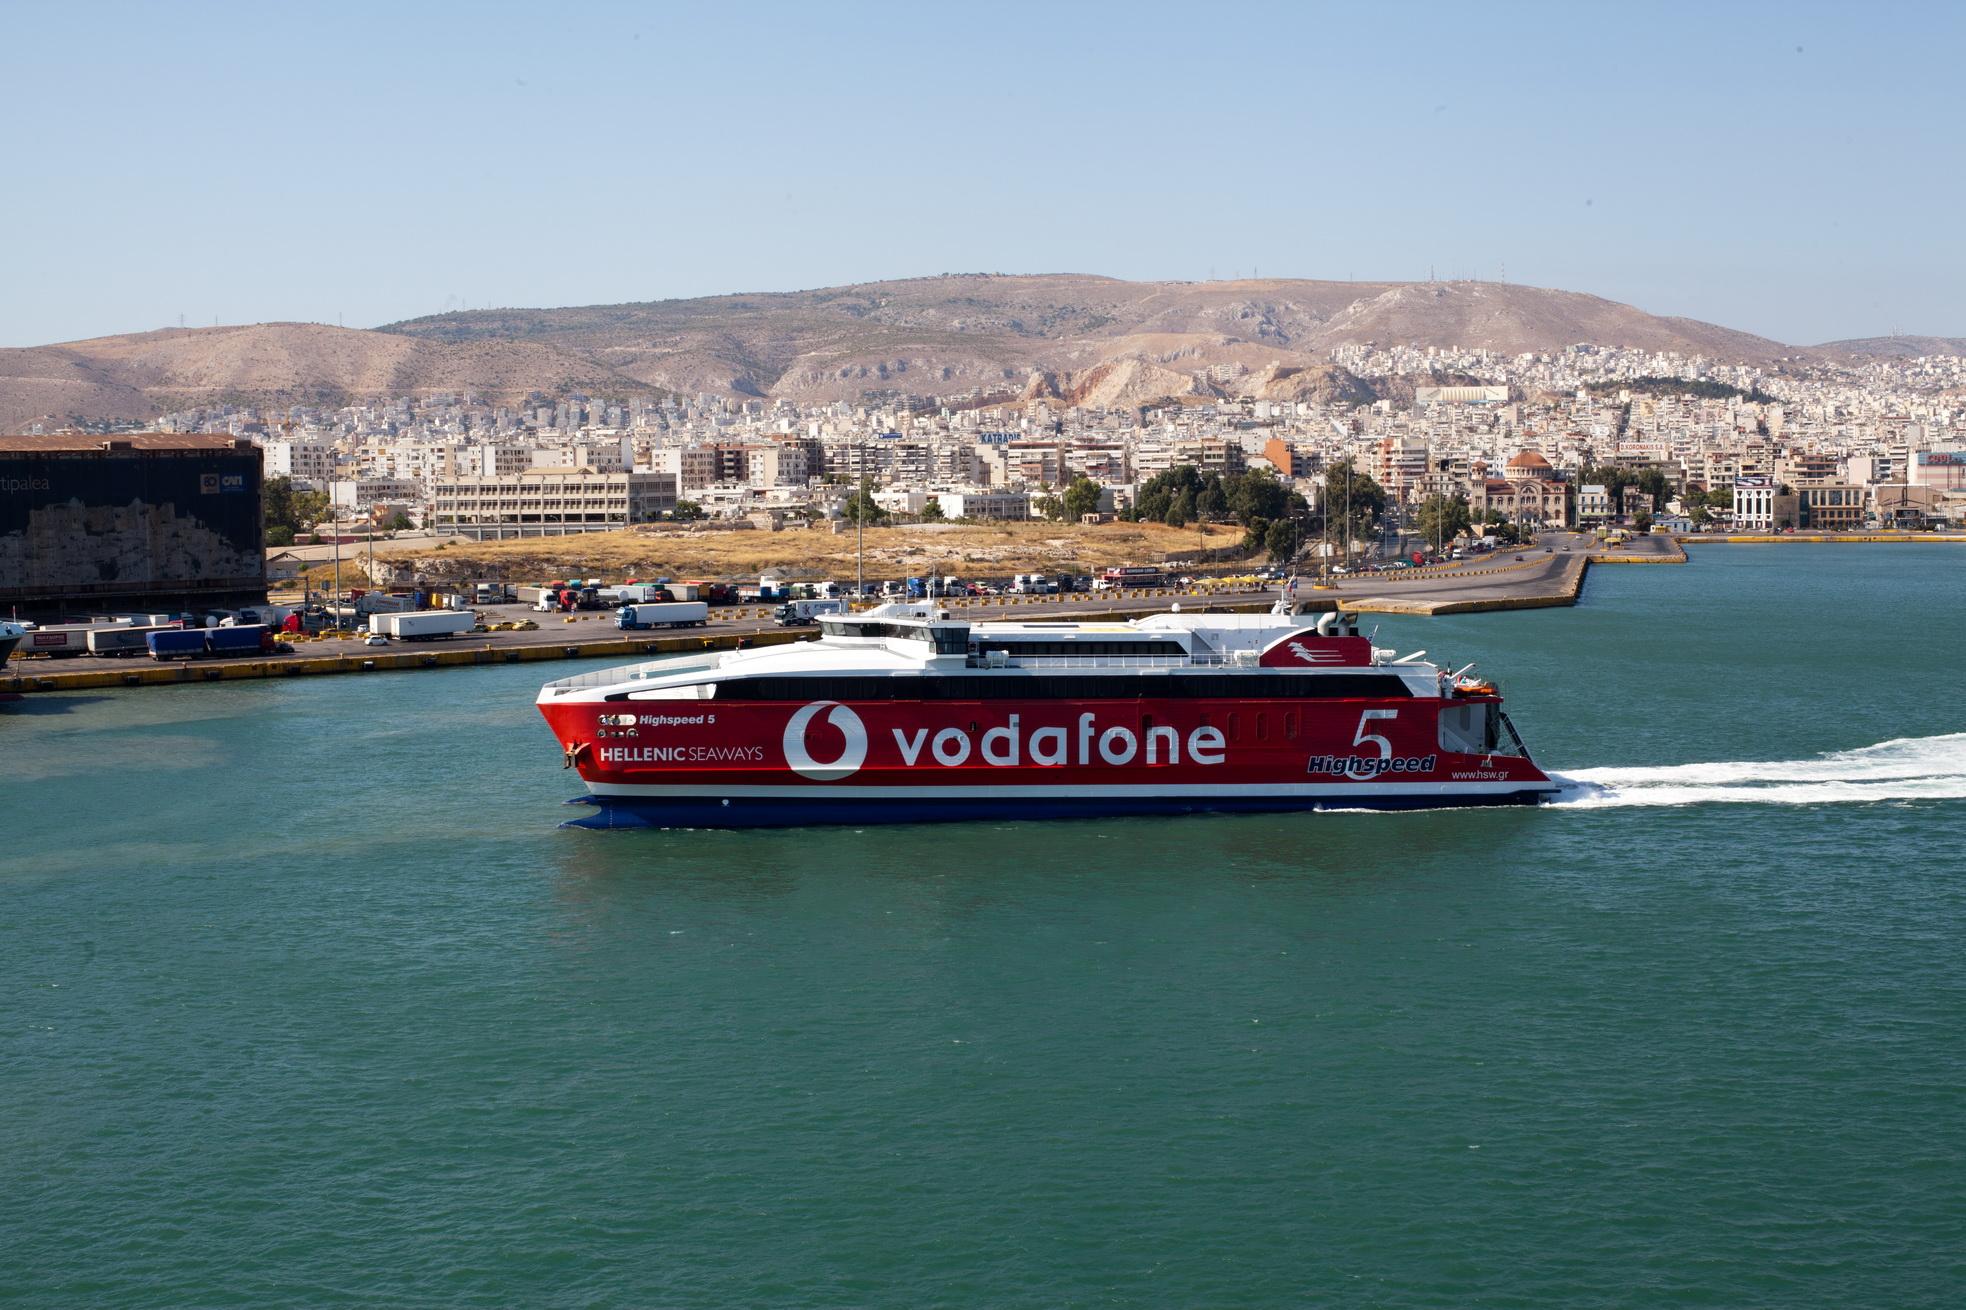 MS Highspeed 5 IMO 9329095 Hellenic Seaways Piraeus Port of Athens Greece 01